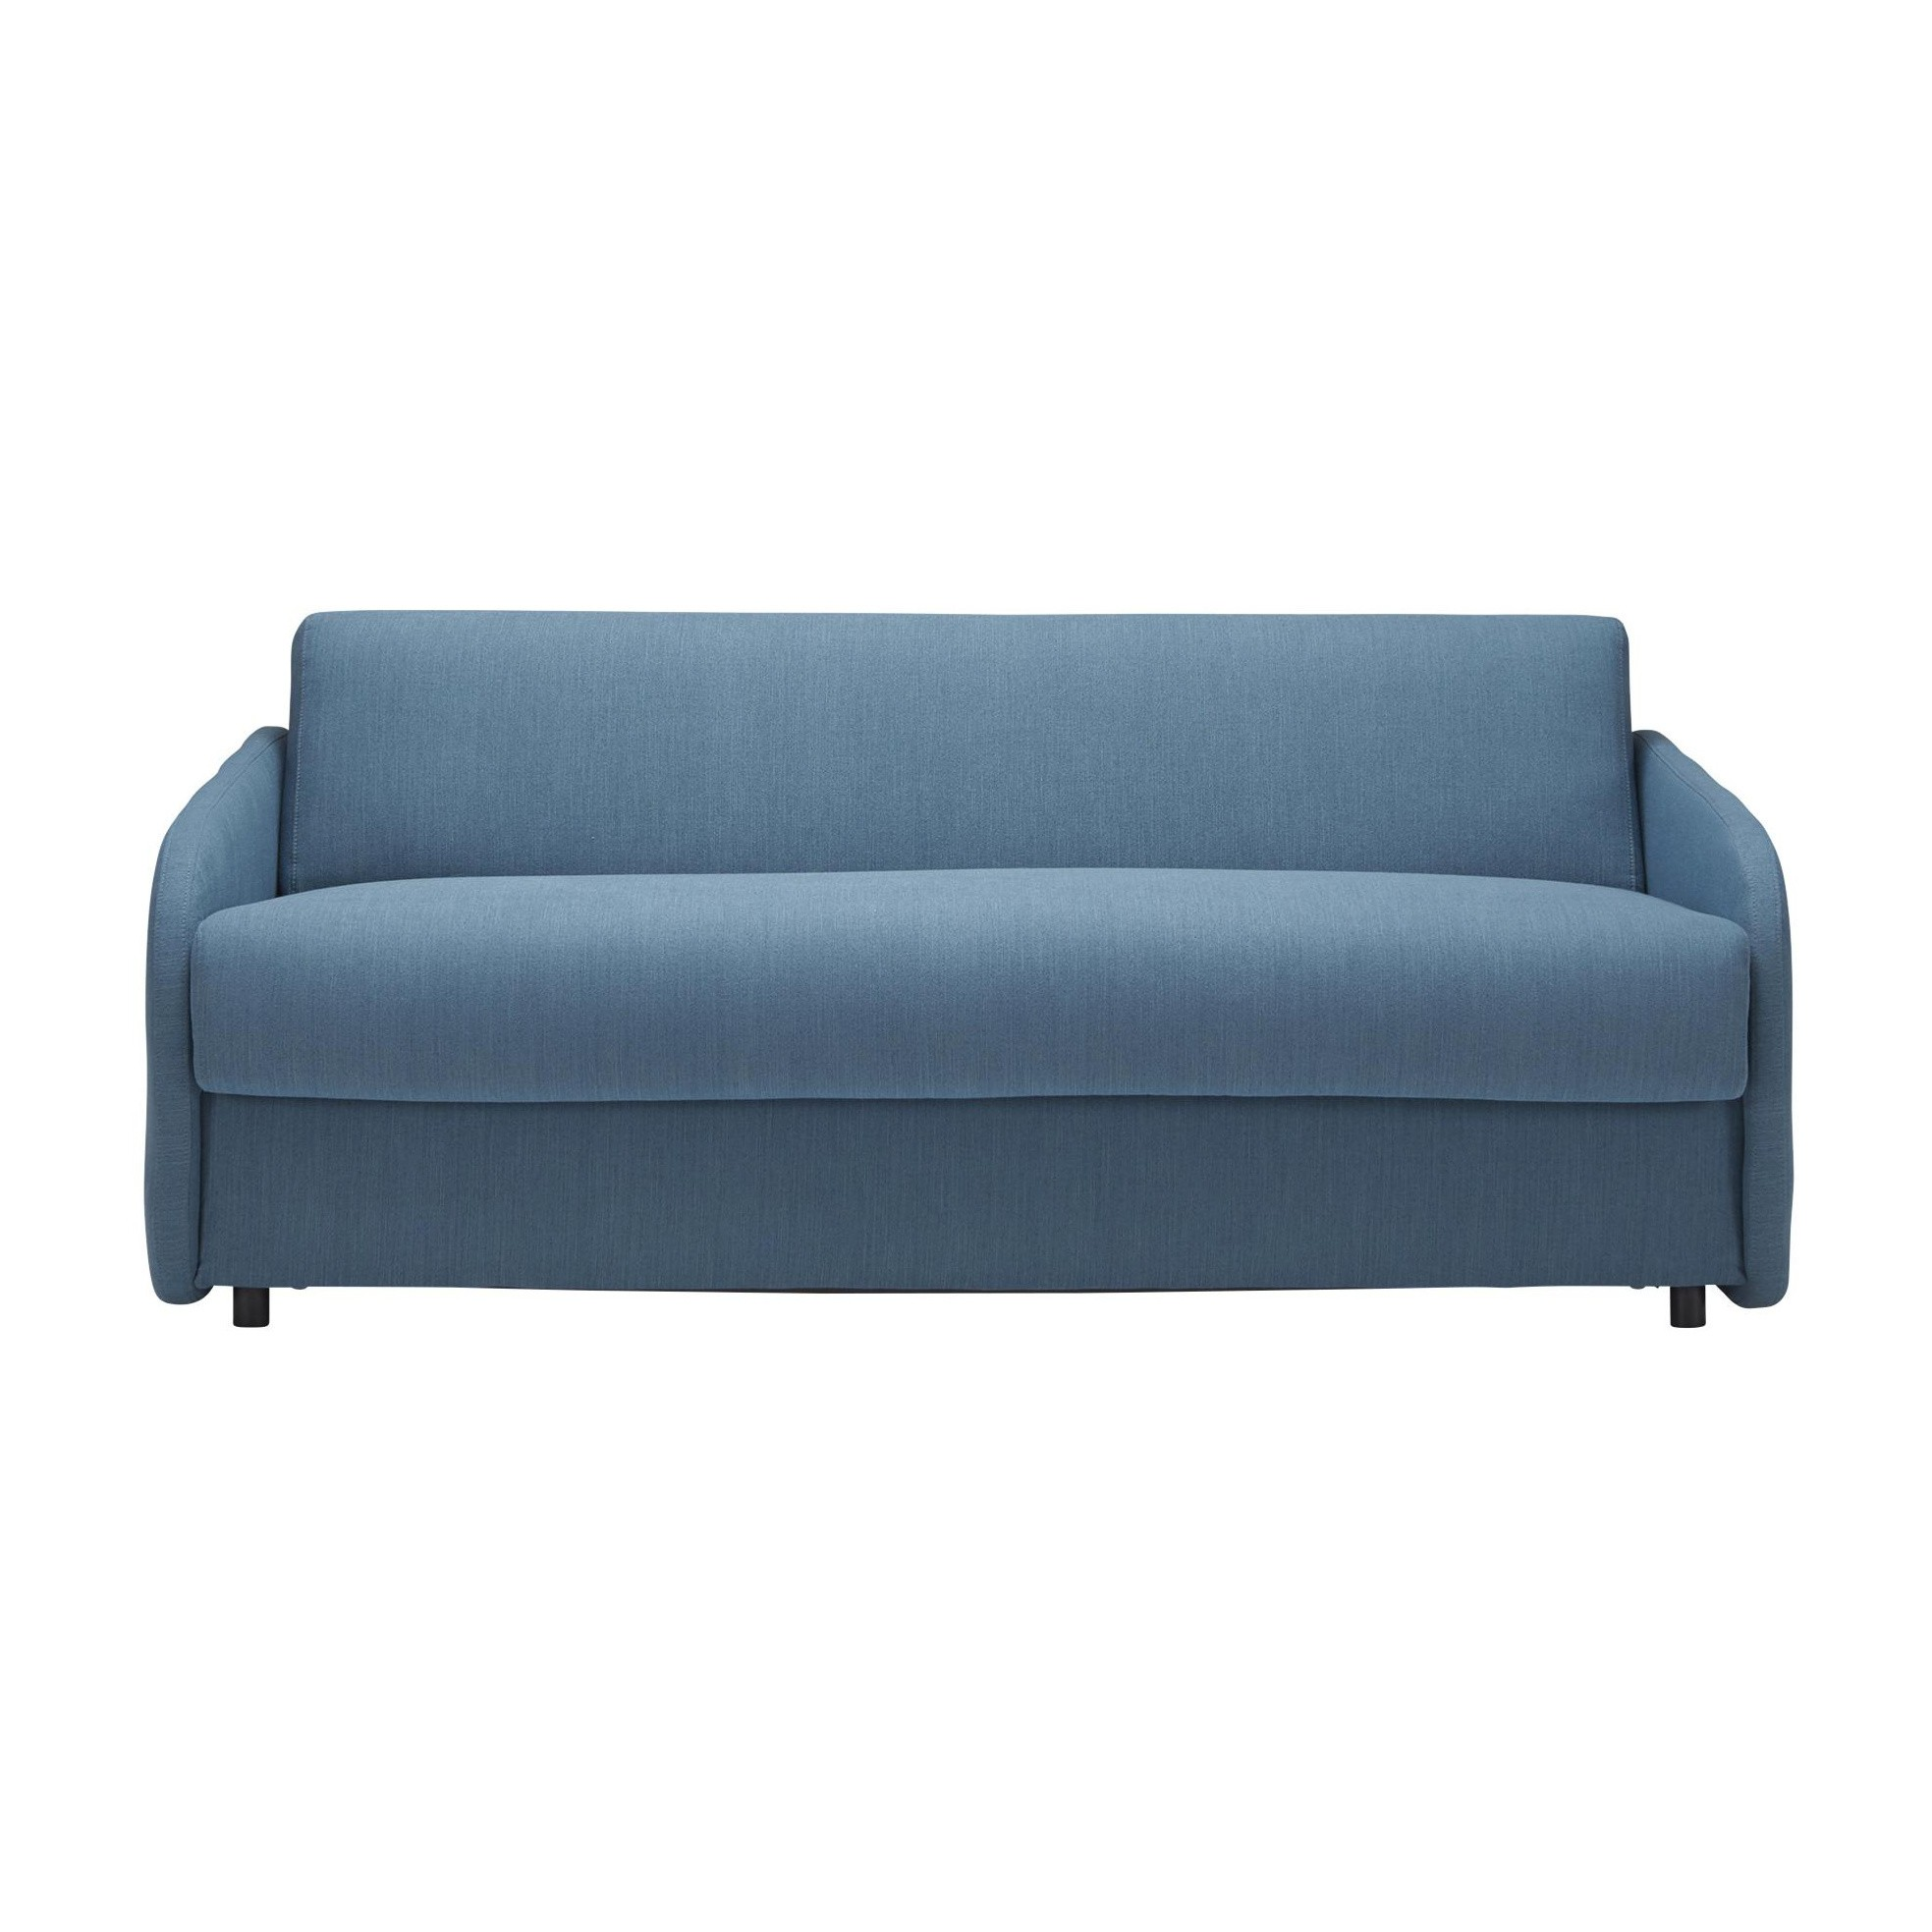 rialto fabric futon sofa bed broyhill loveseat sleeper elegant grey beds futons pull